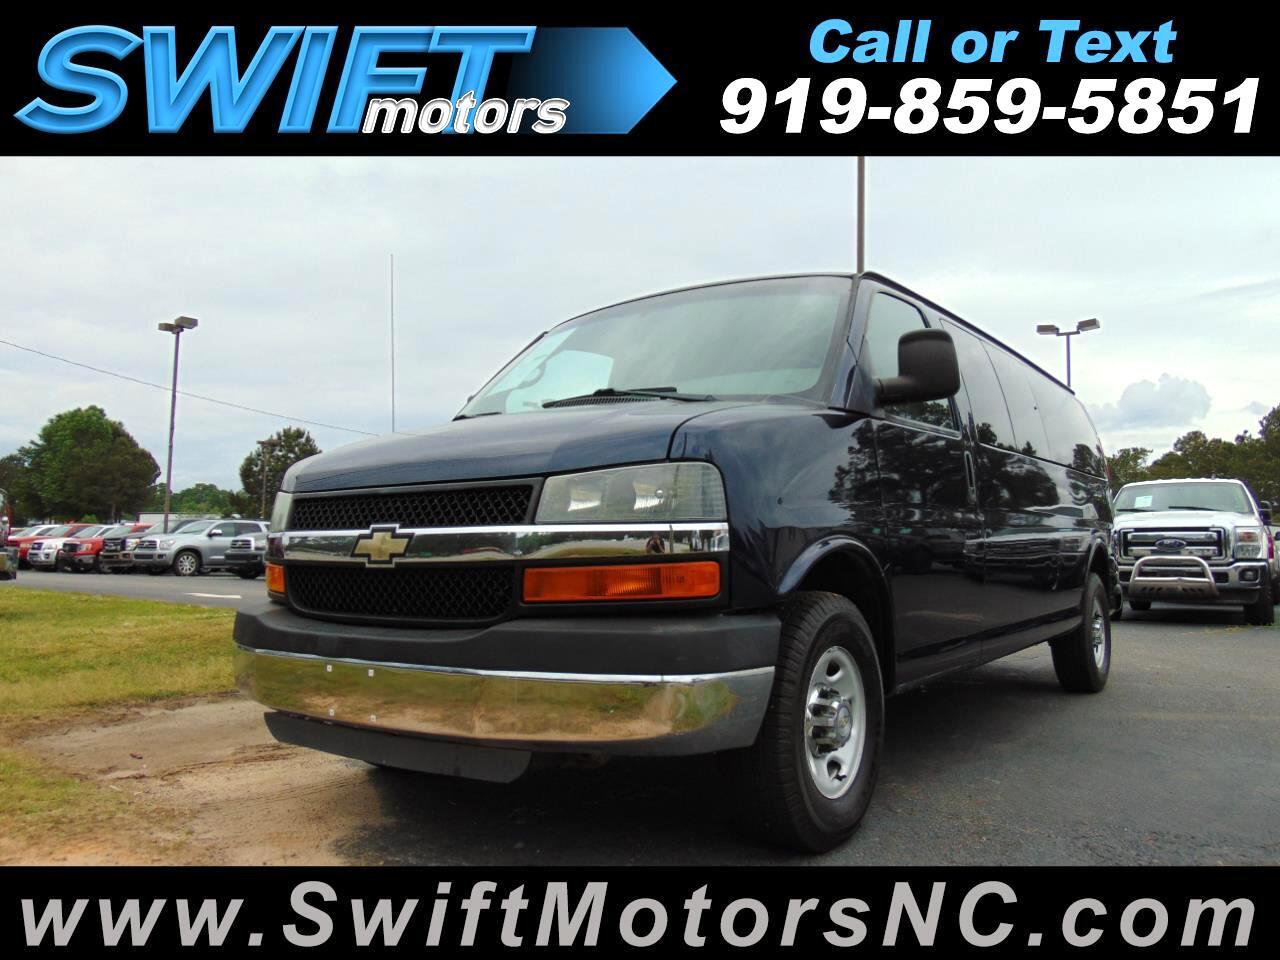 2011 Chevrolet Express RWD 3500 155